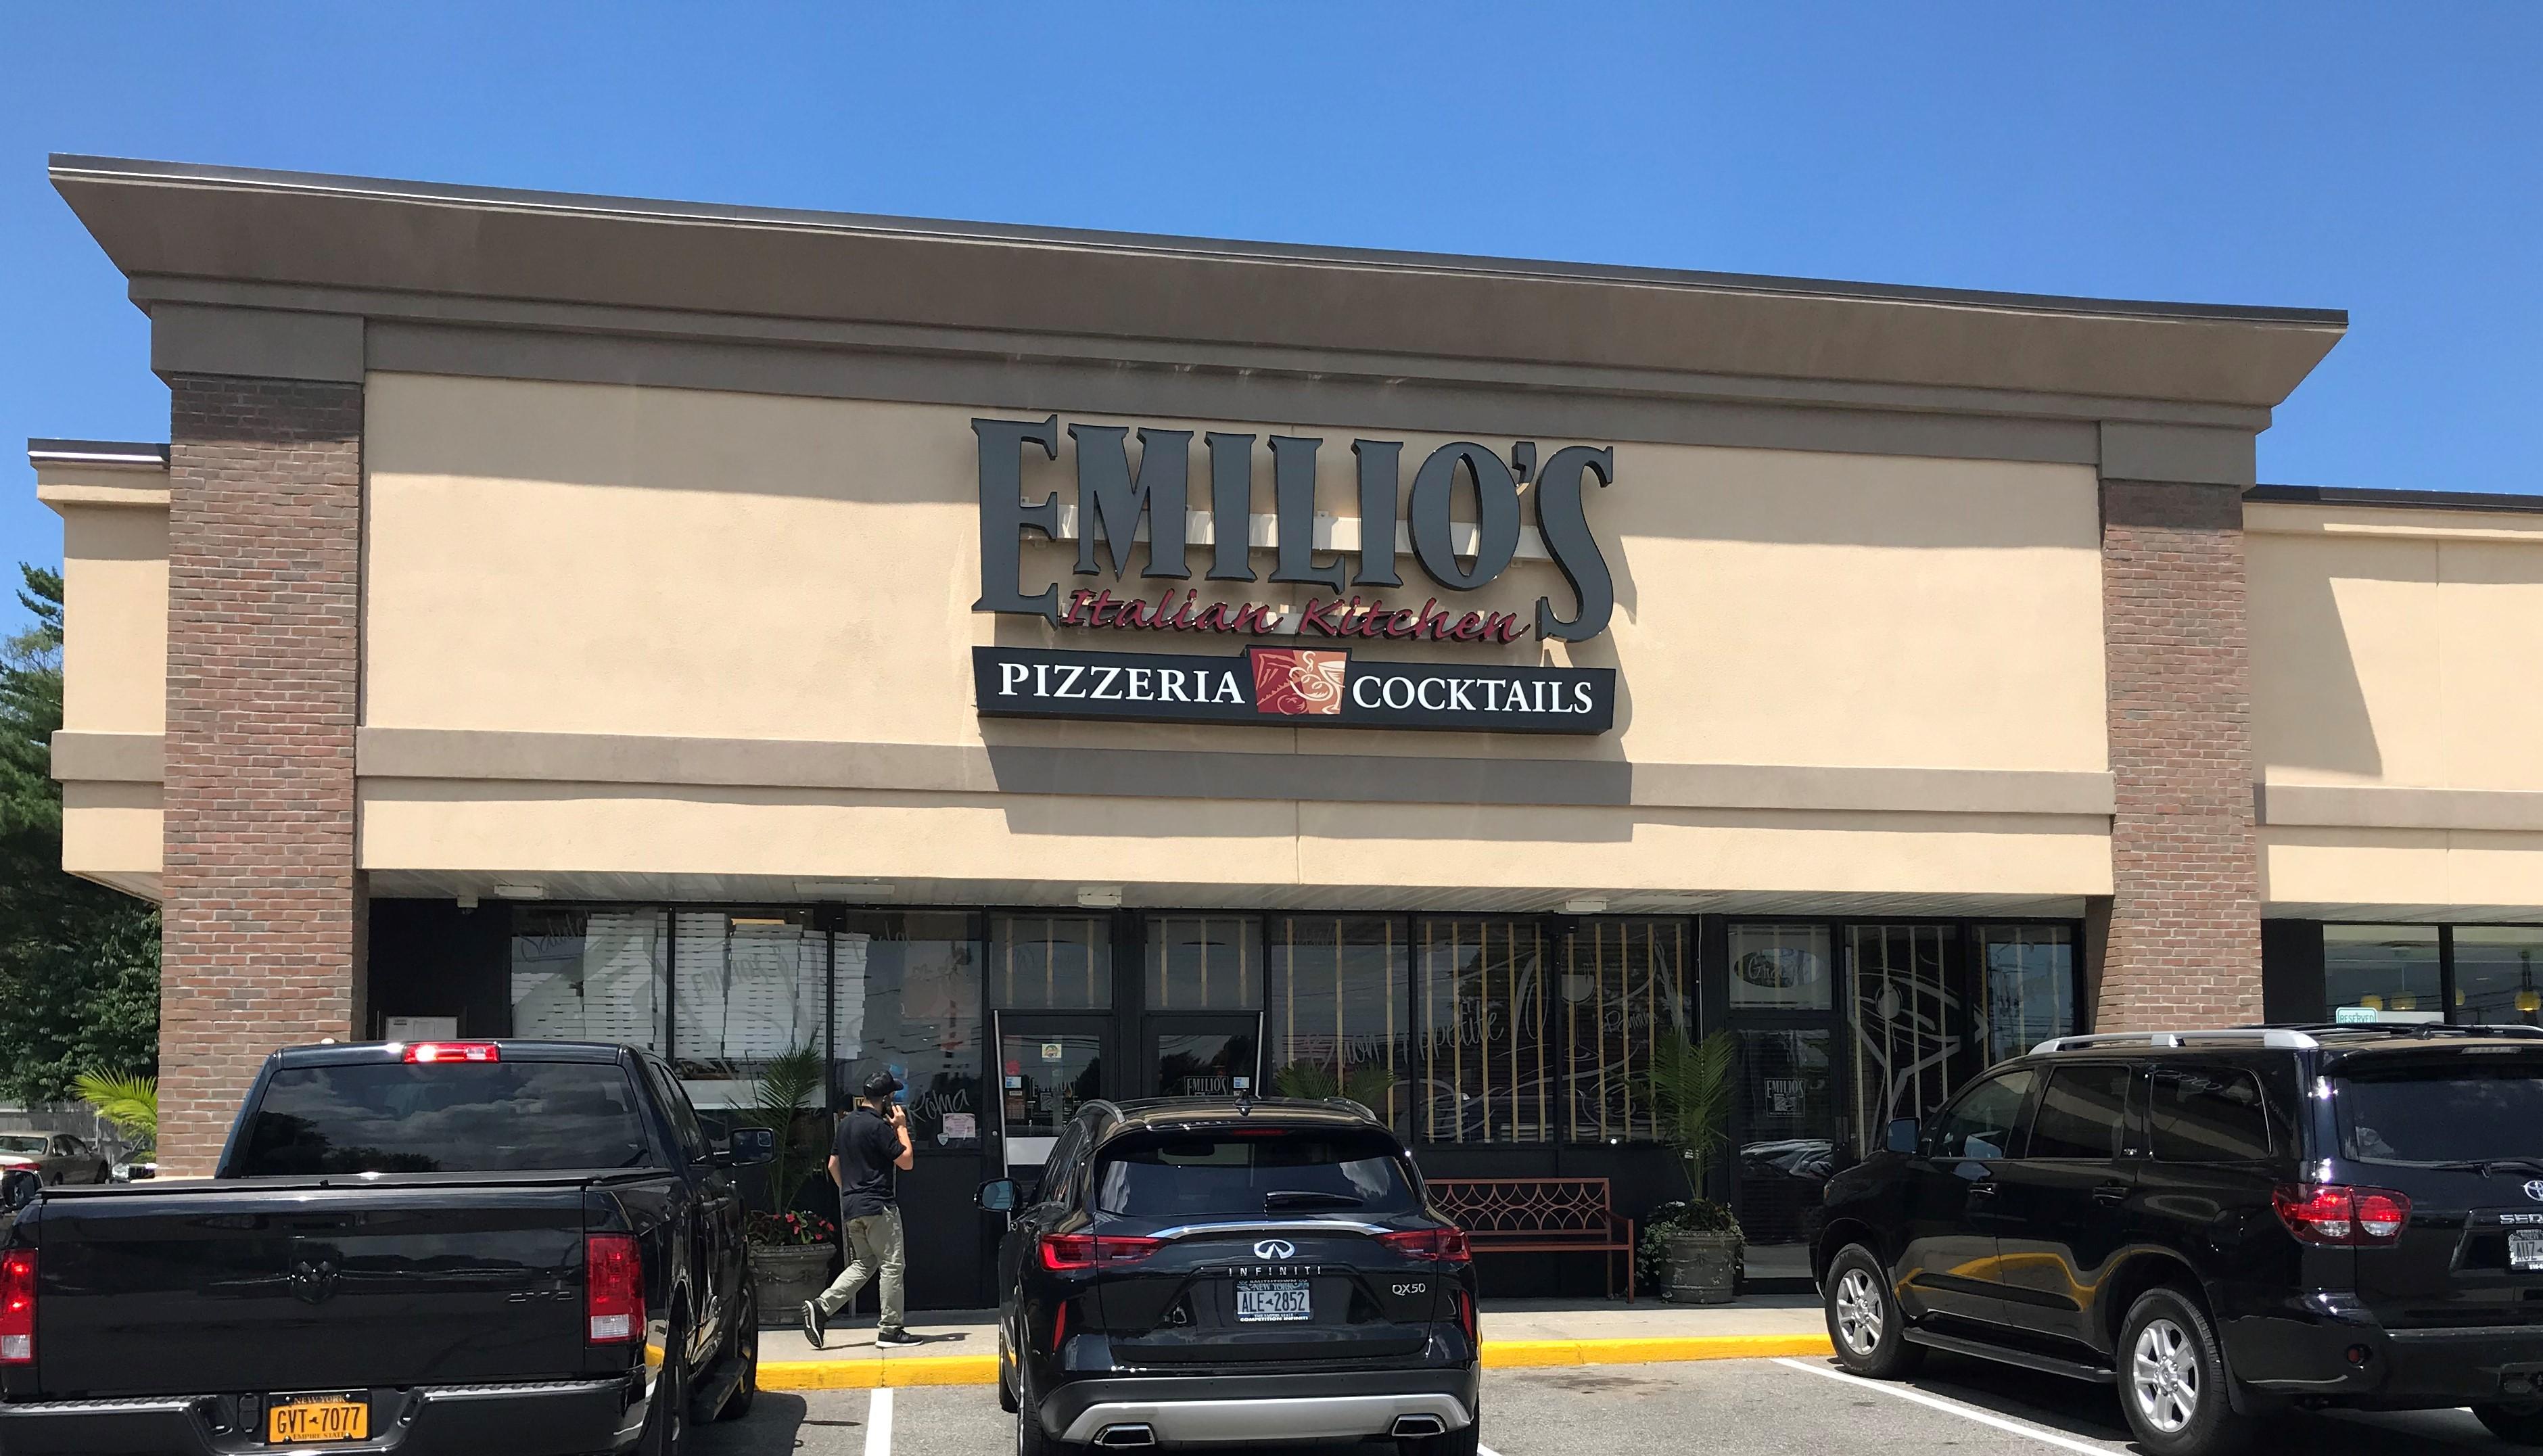 Emilio's Italian Kitchen & Pizzeria